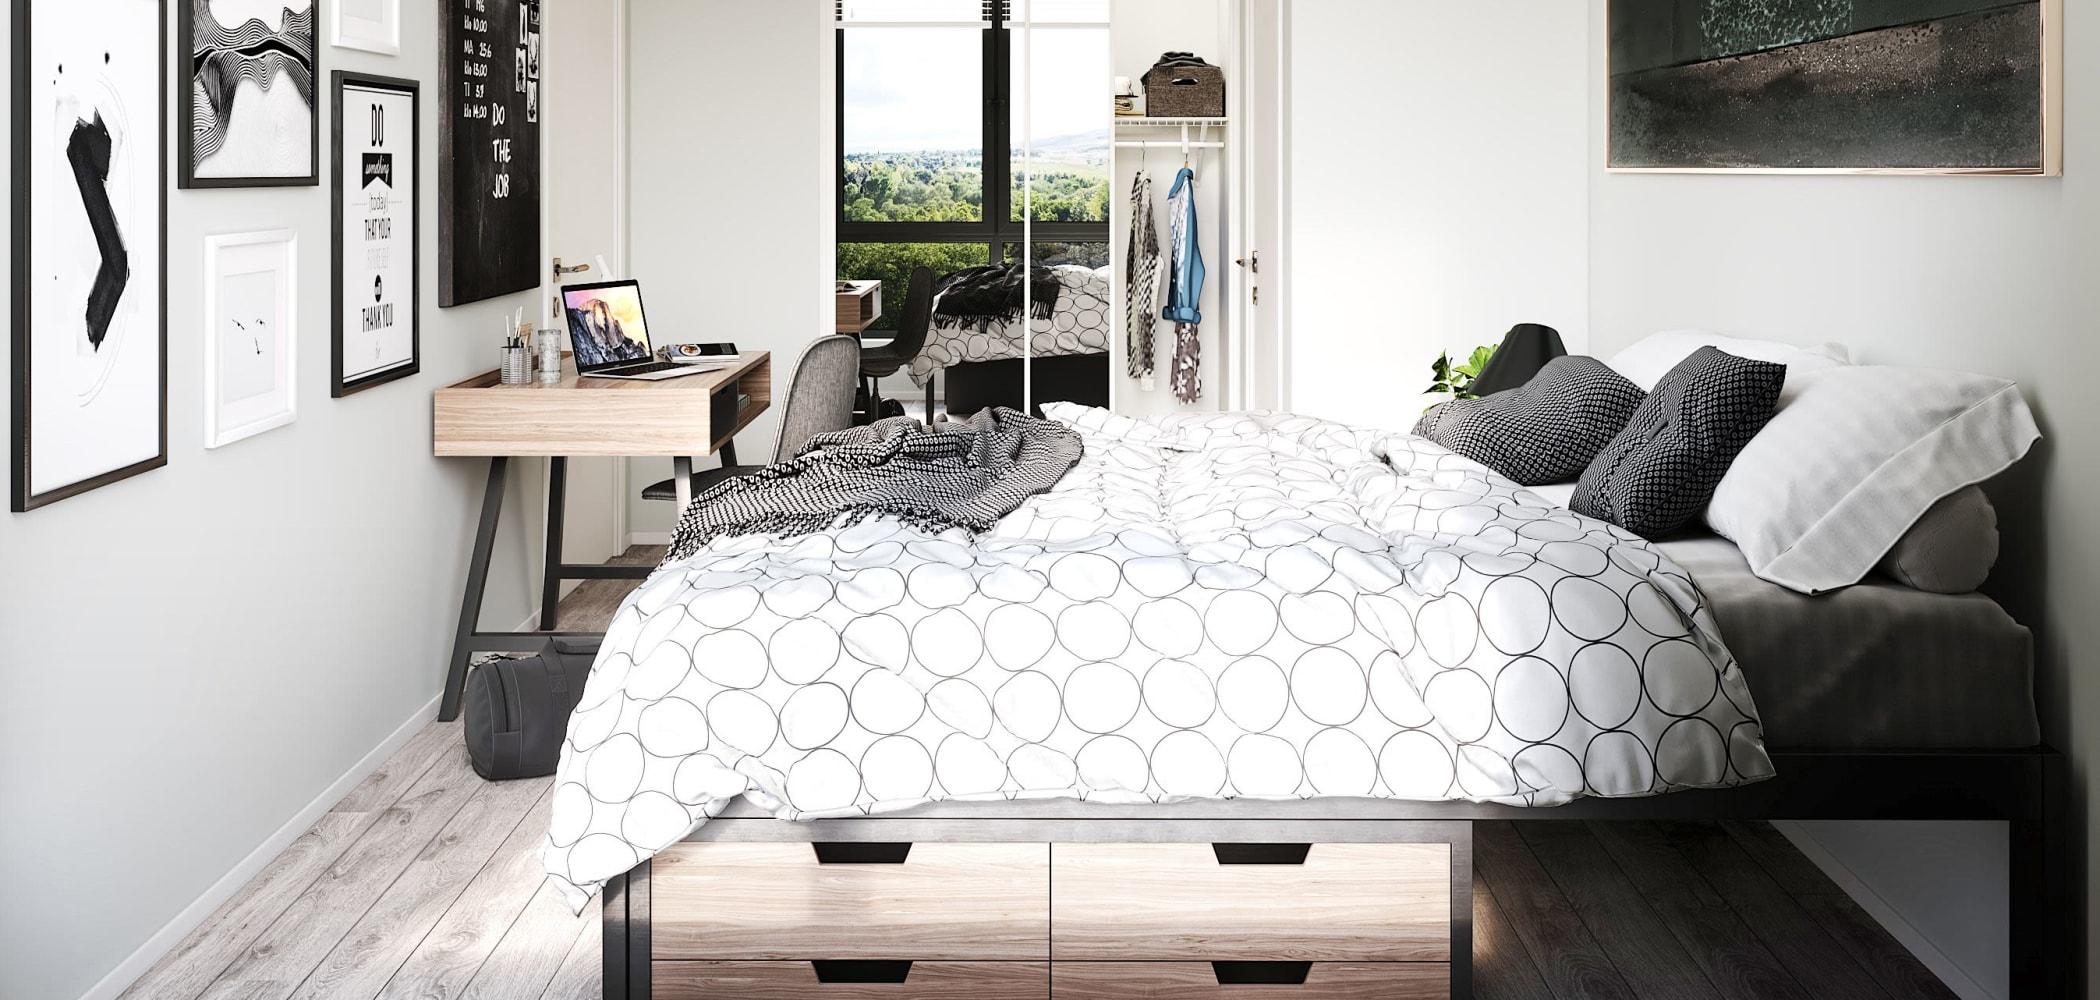 Bright bedroom with a study area at UNCOMMON Reno in Reno, Nevada